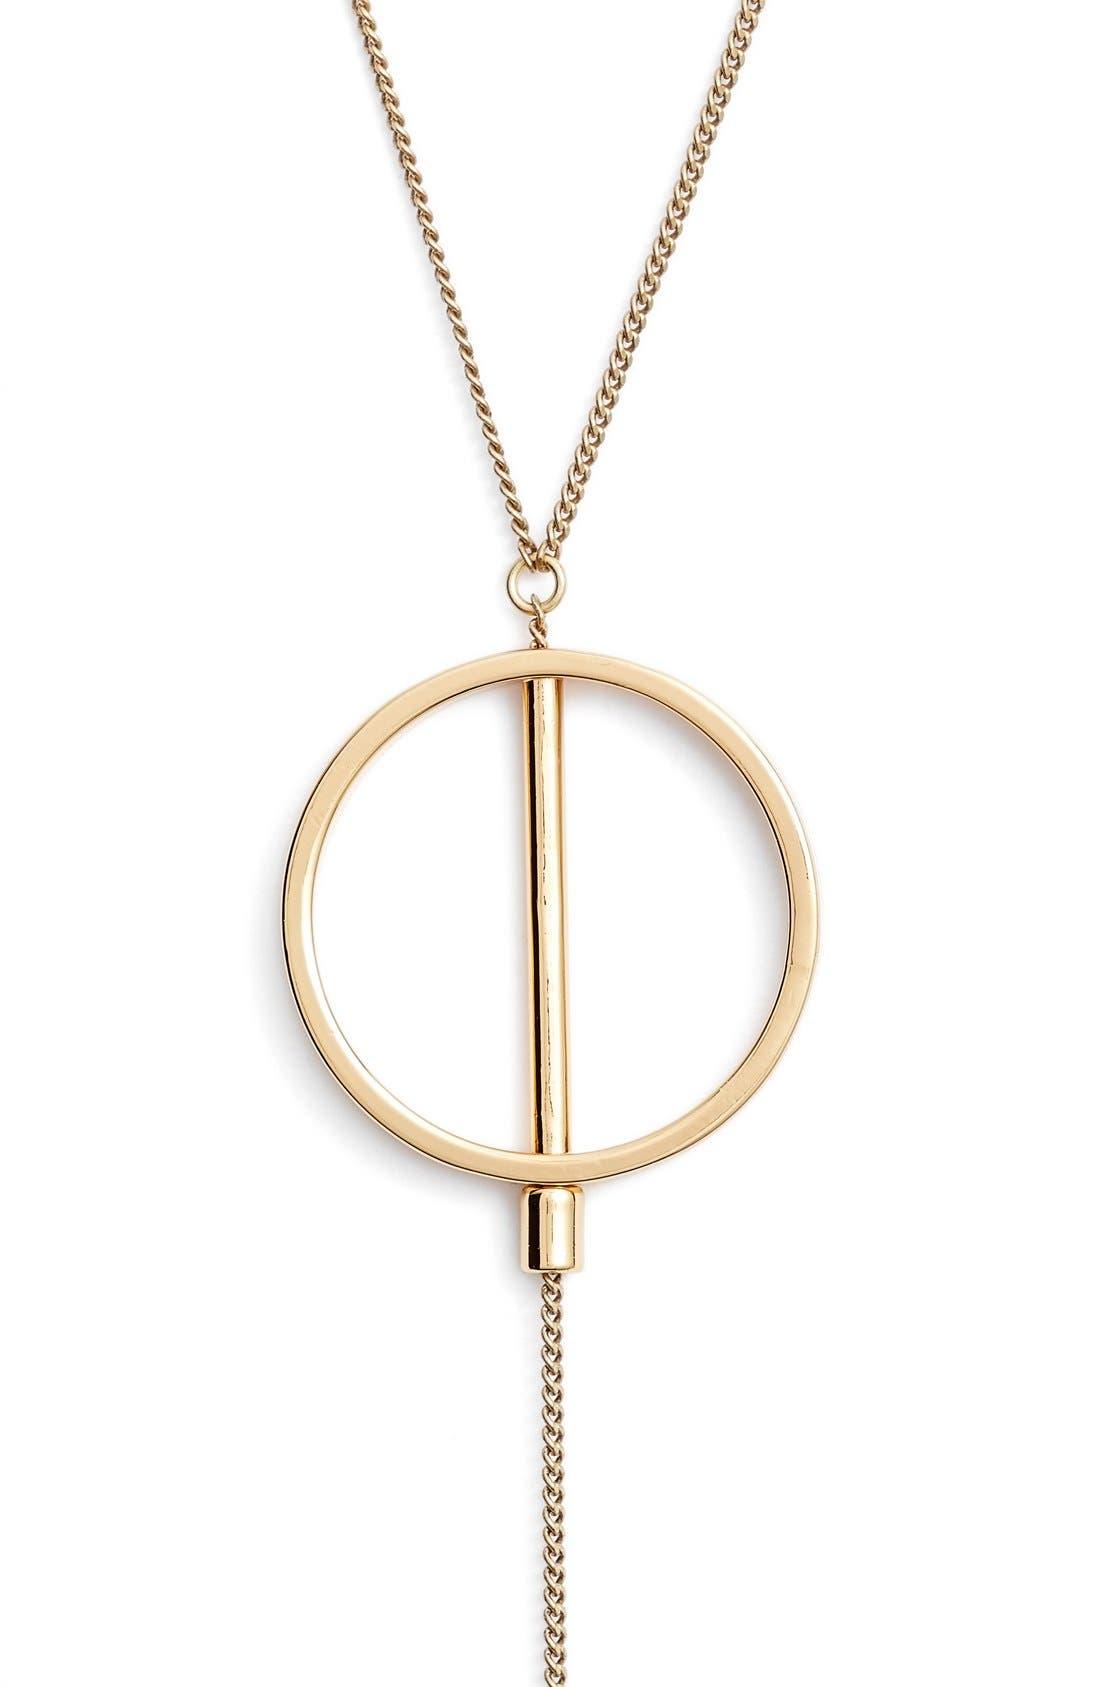 Rhine Lariat Necklace,                         Main,                         color, Gold